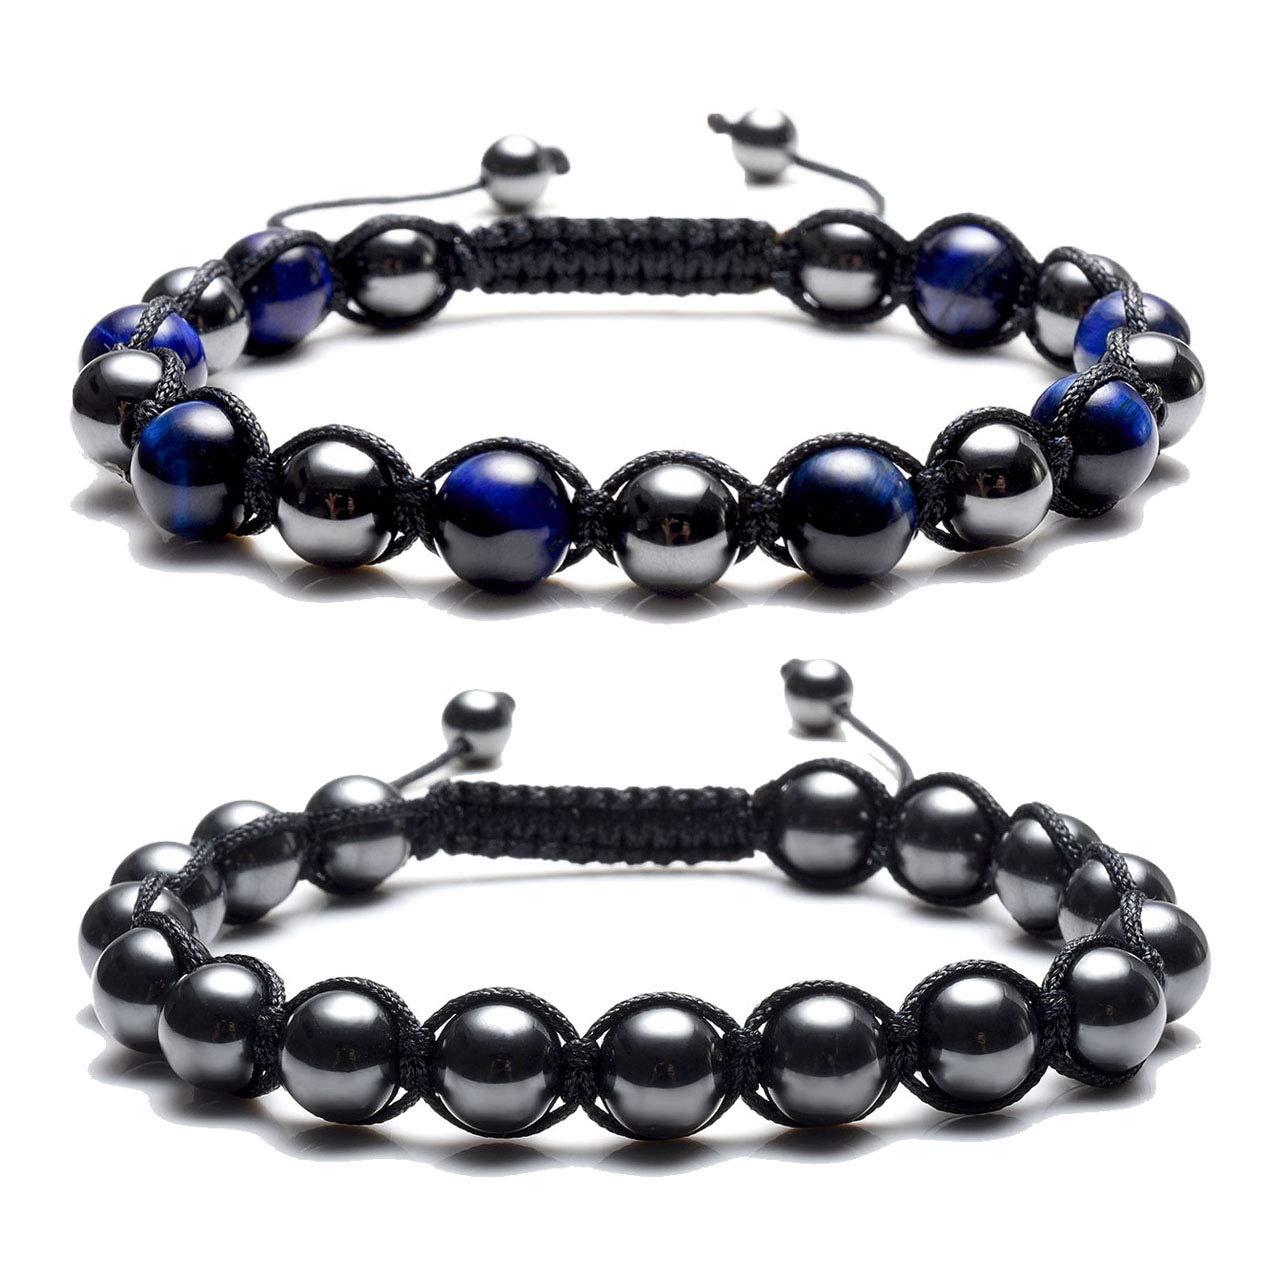 Top Plaza Men Women Reiki Healing Energy Natural Tiger Eye Stone Magnetic Hematite Therapy Beads Macrame Adjustable Braided Link Bracelet ATPUS66705